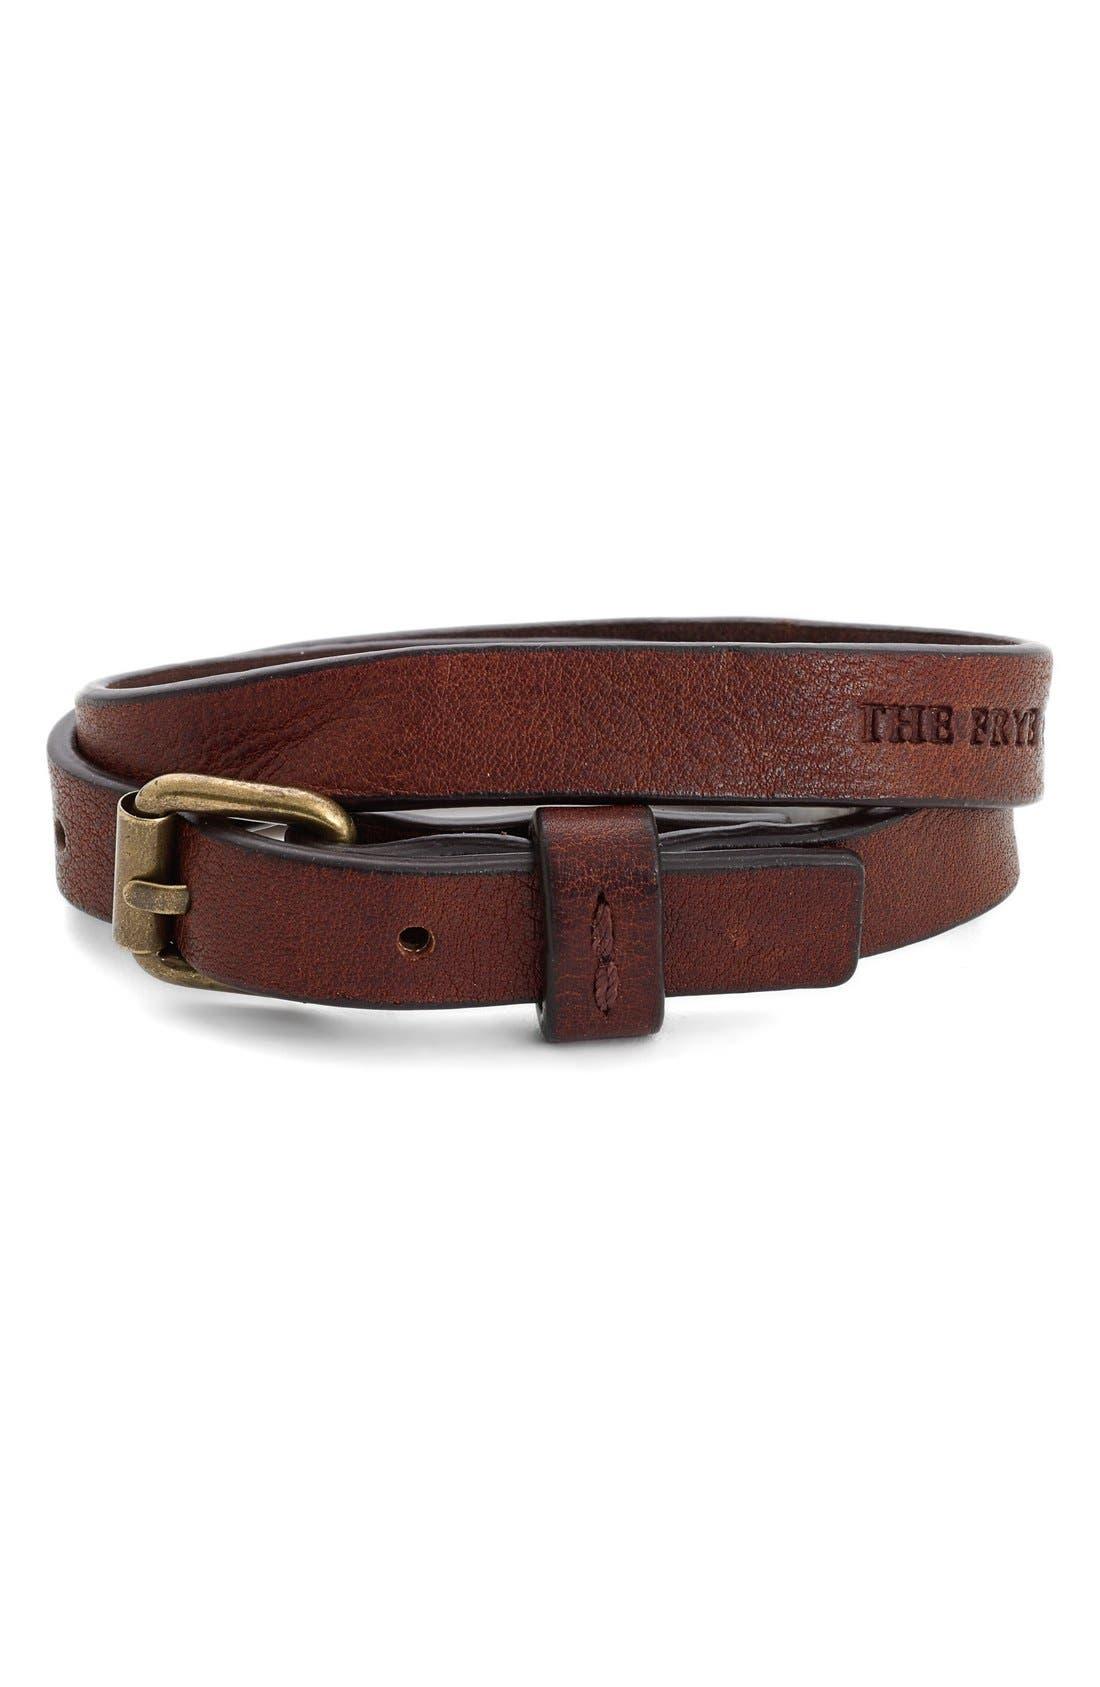 Alternate Image 1 Selected - Frye Leather Wrap Bracelet